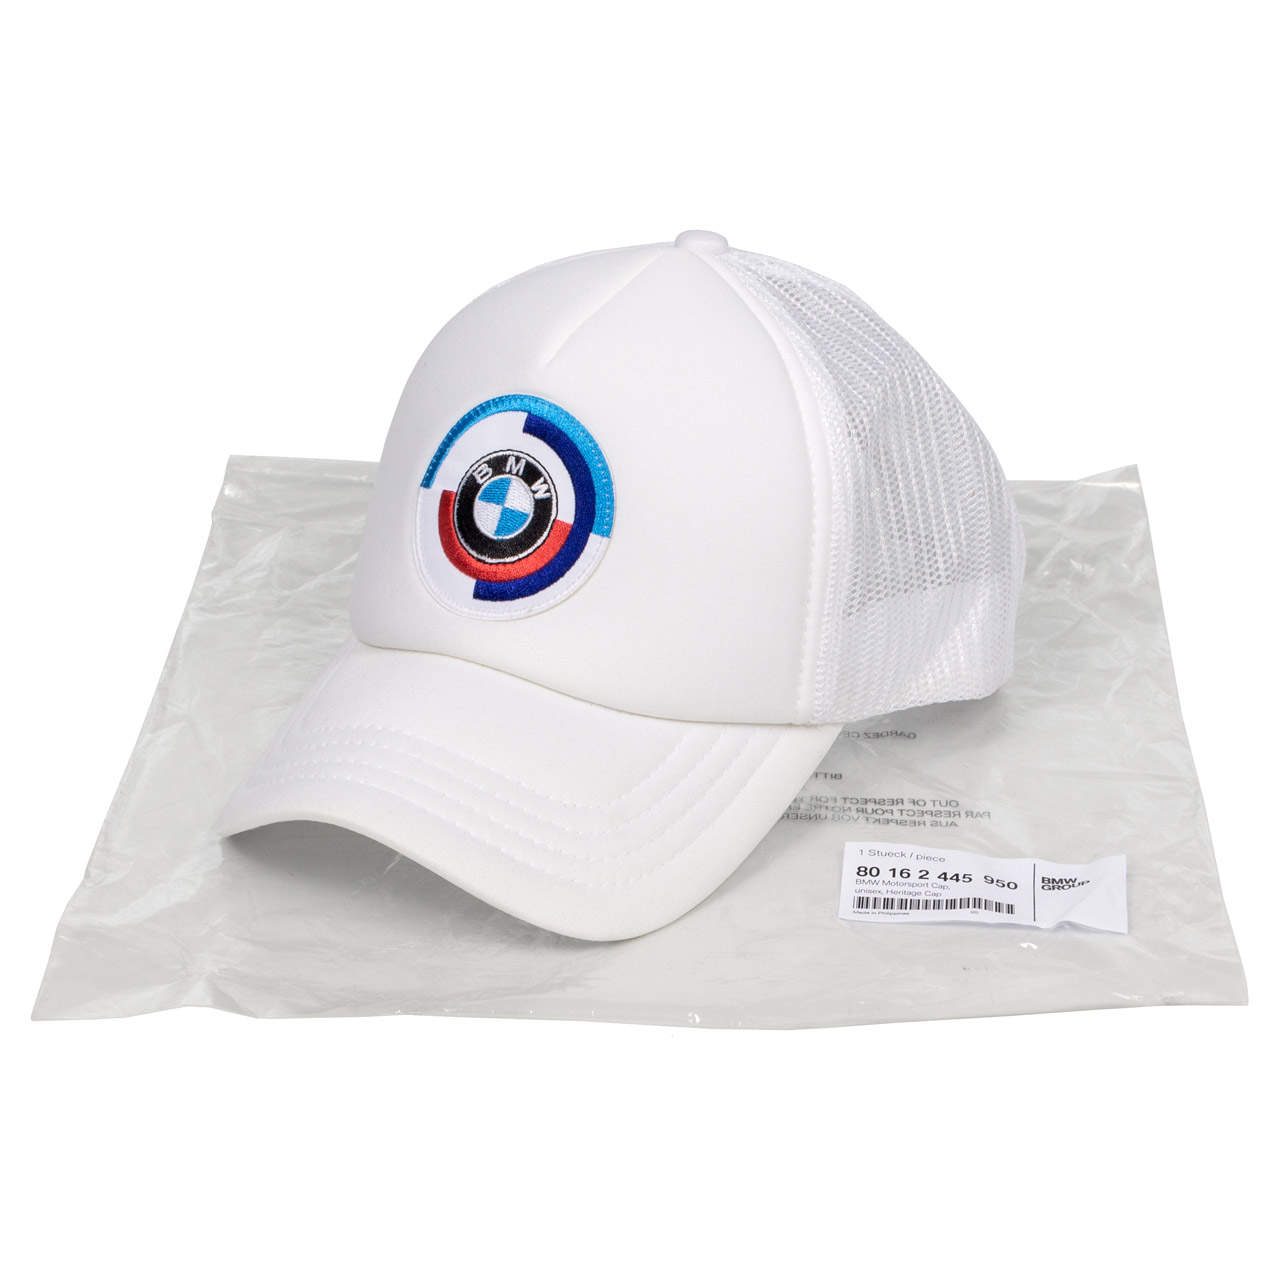 ORIGINAL BMW Collectors Baseball Cap Basecap Kappe Mütze UNISEX 80162445950